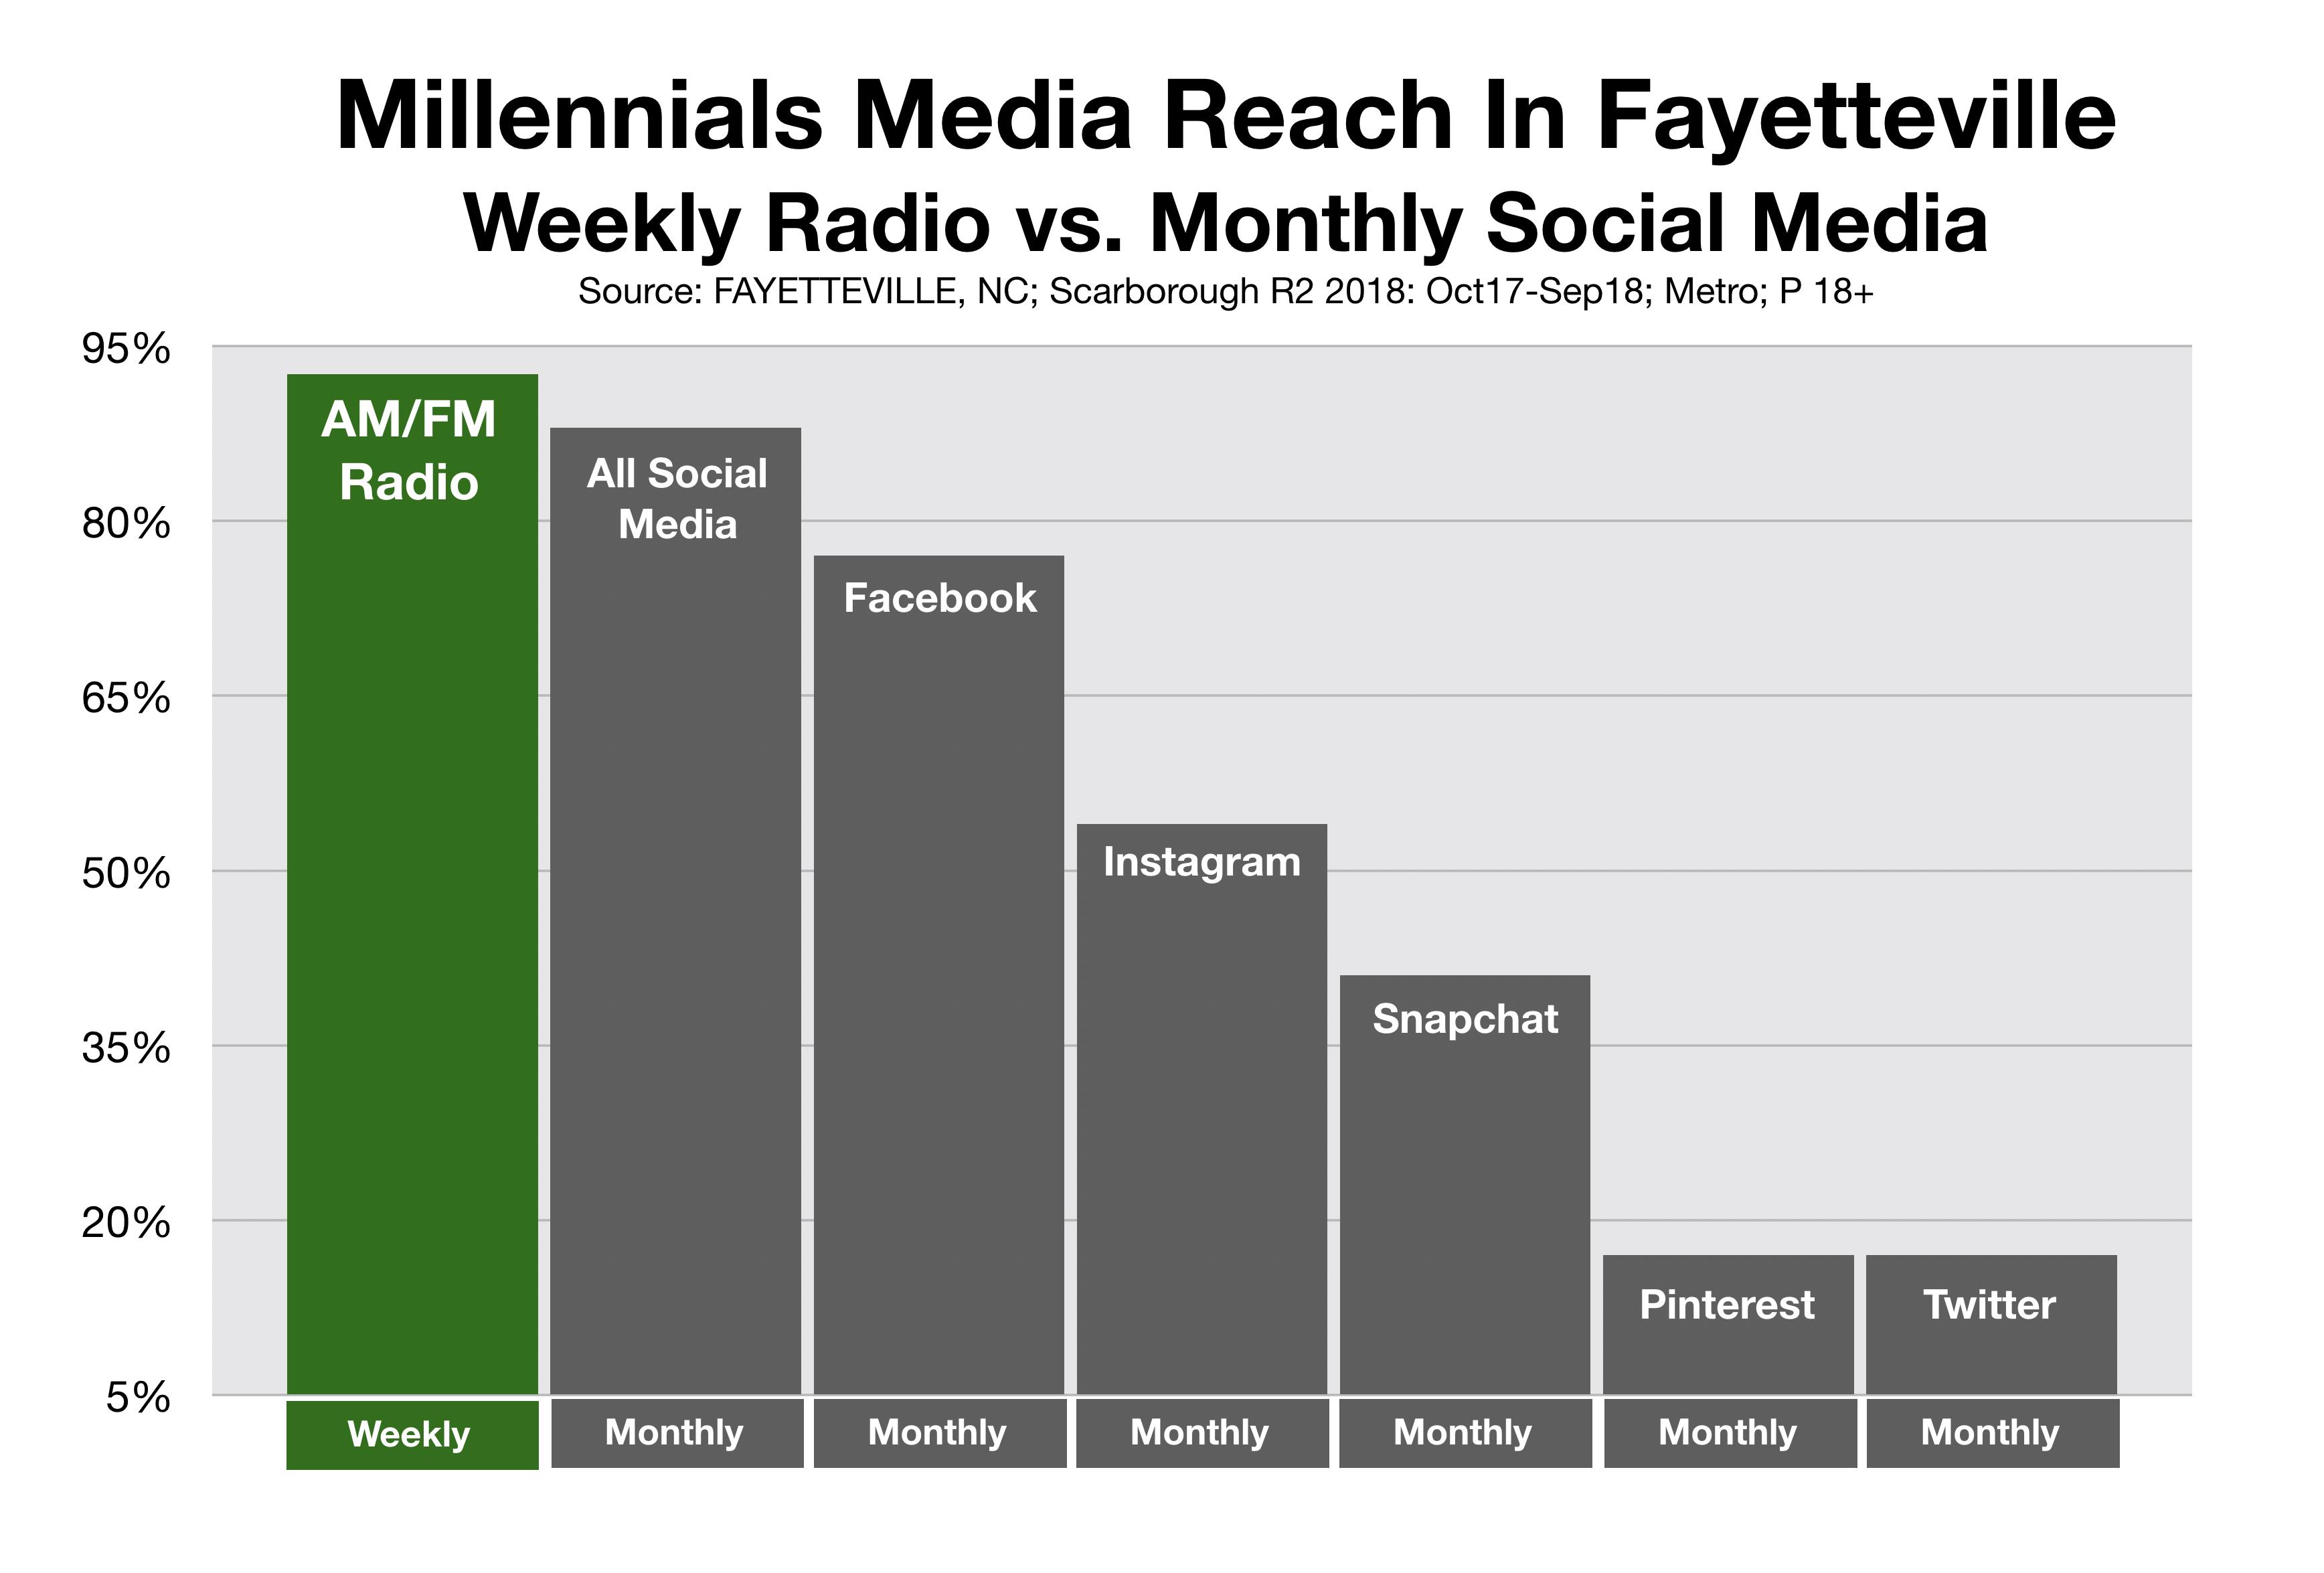 Advertising In Fayetteville Millennial Social Media Reach